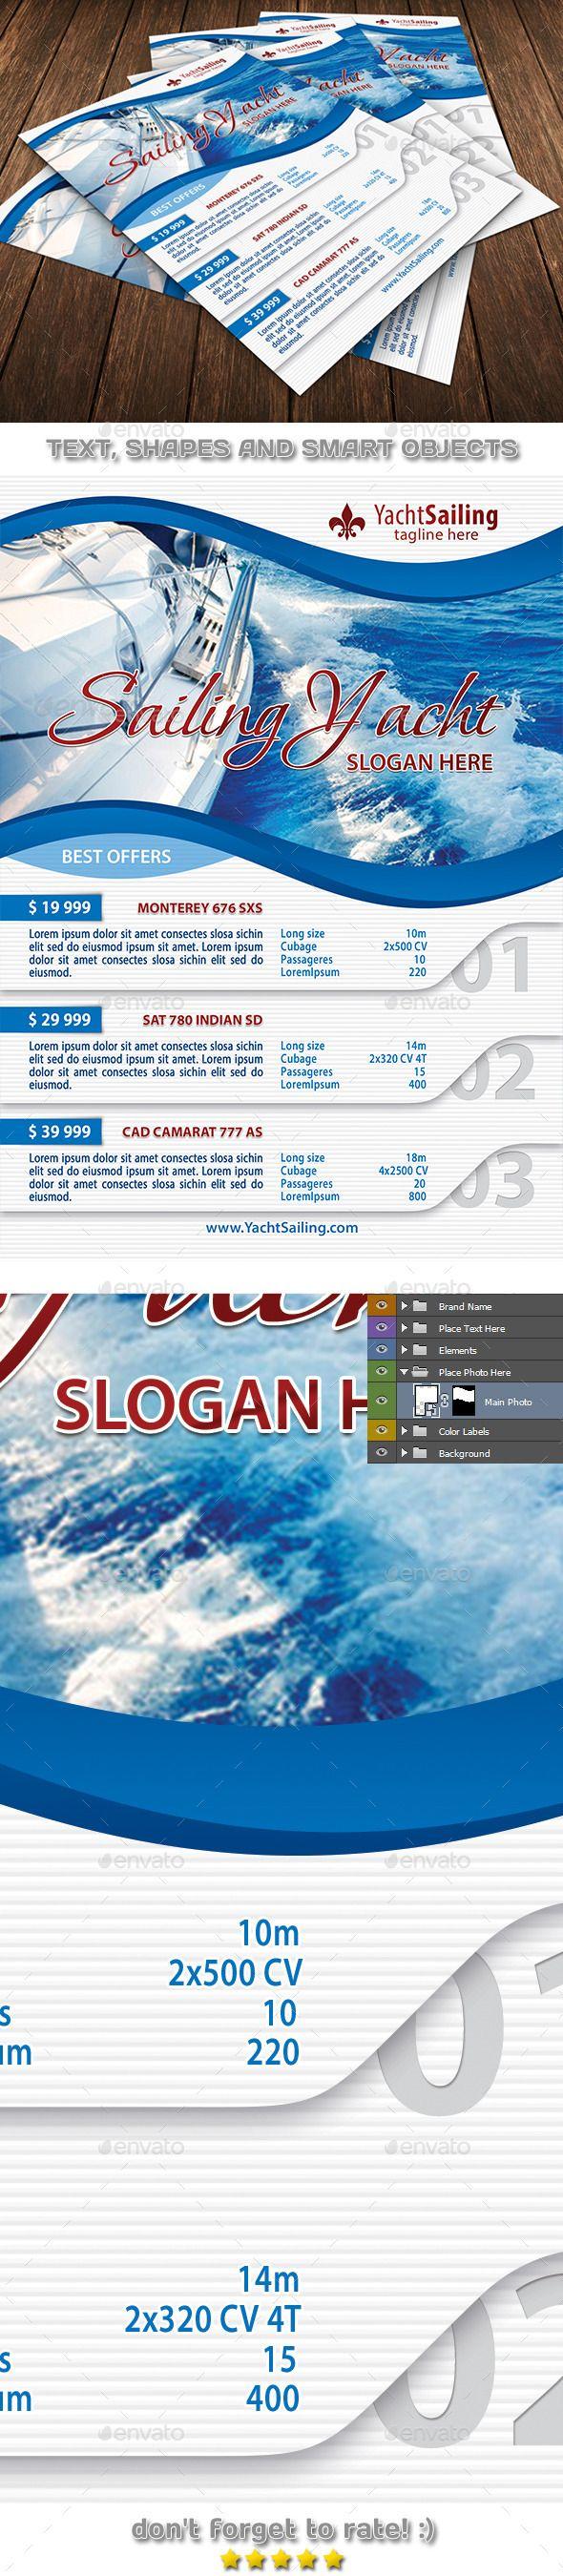 Yacht Sailing Travel Club Flyer Template 98 - Flyers Print Templates